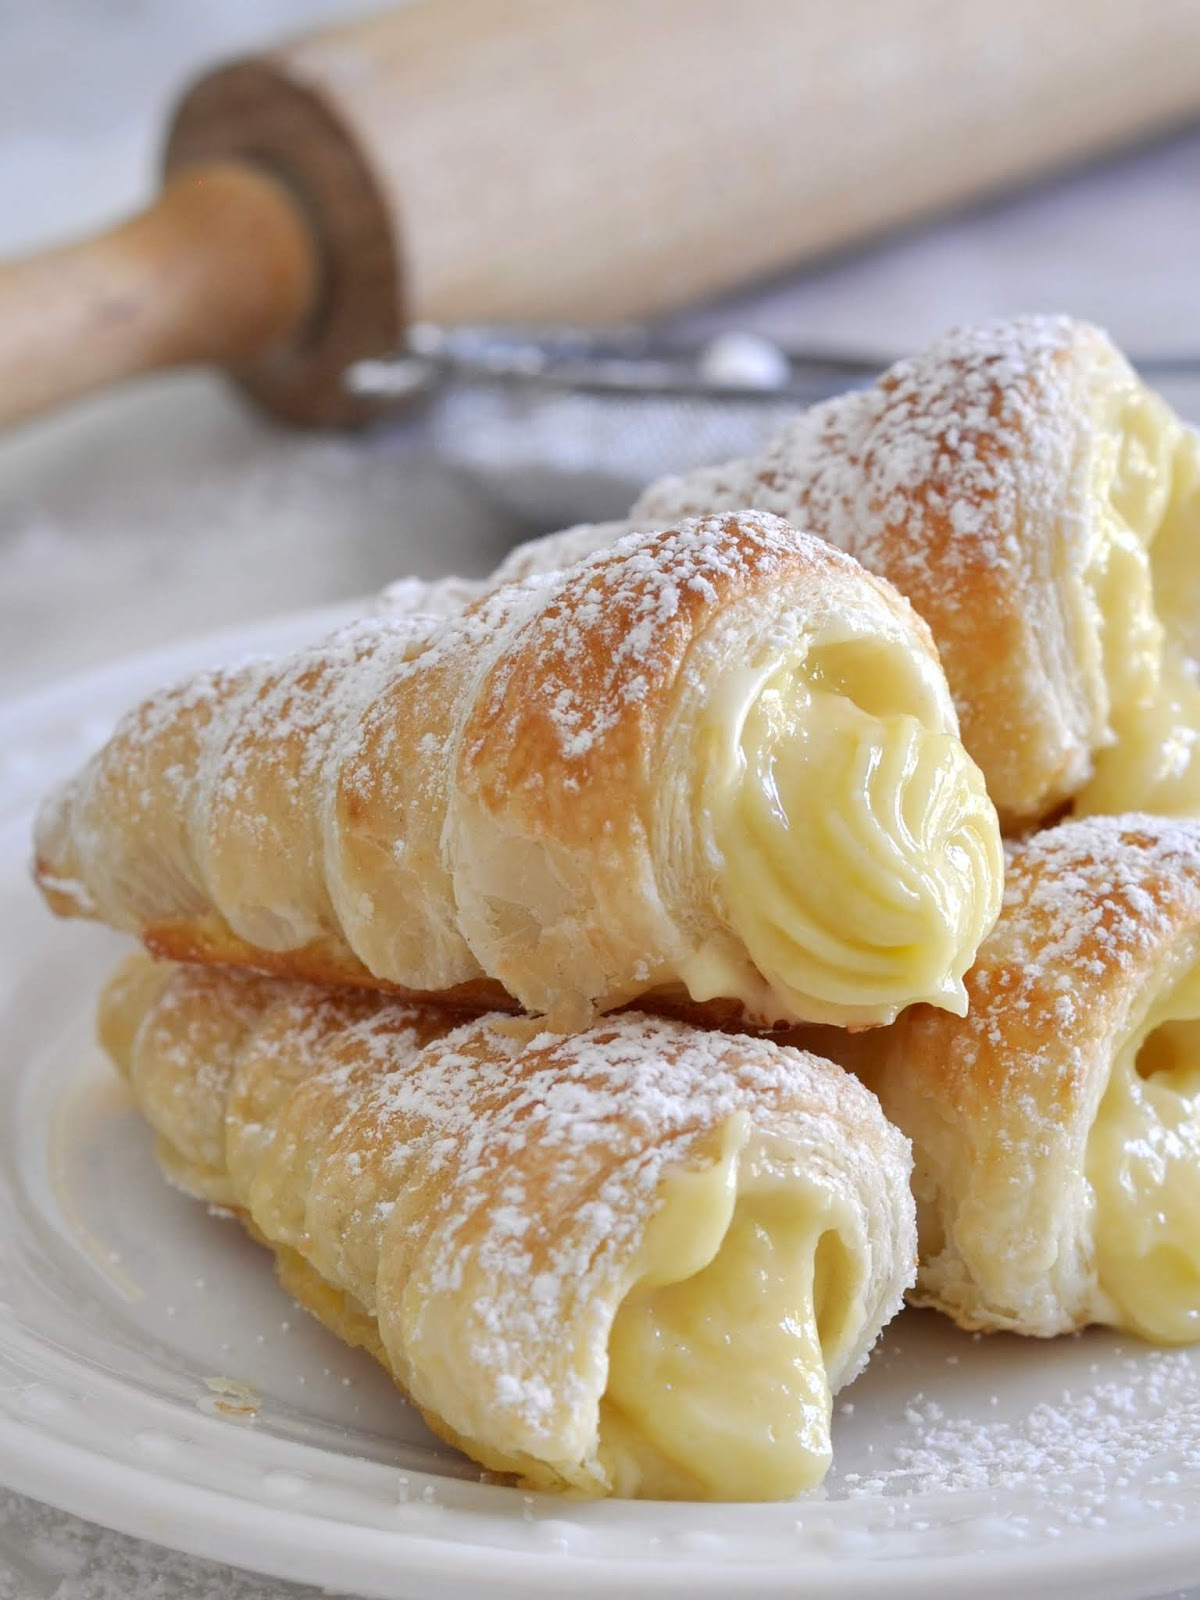 Italian Cream Stuffed Cannoncini (Puff PastryHorns)